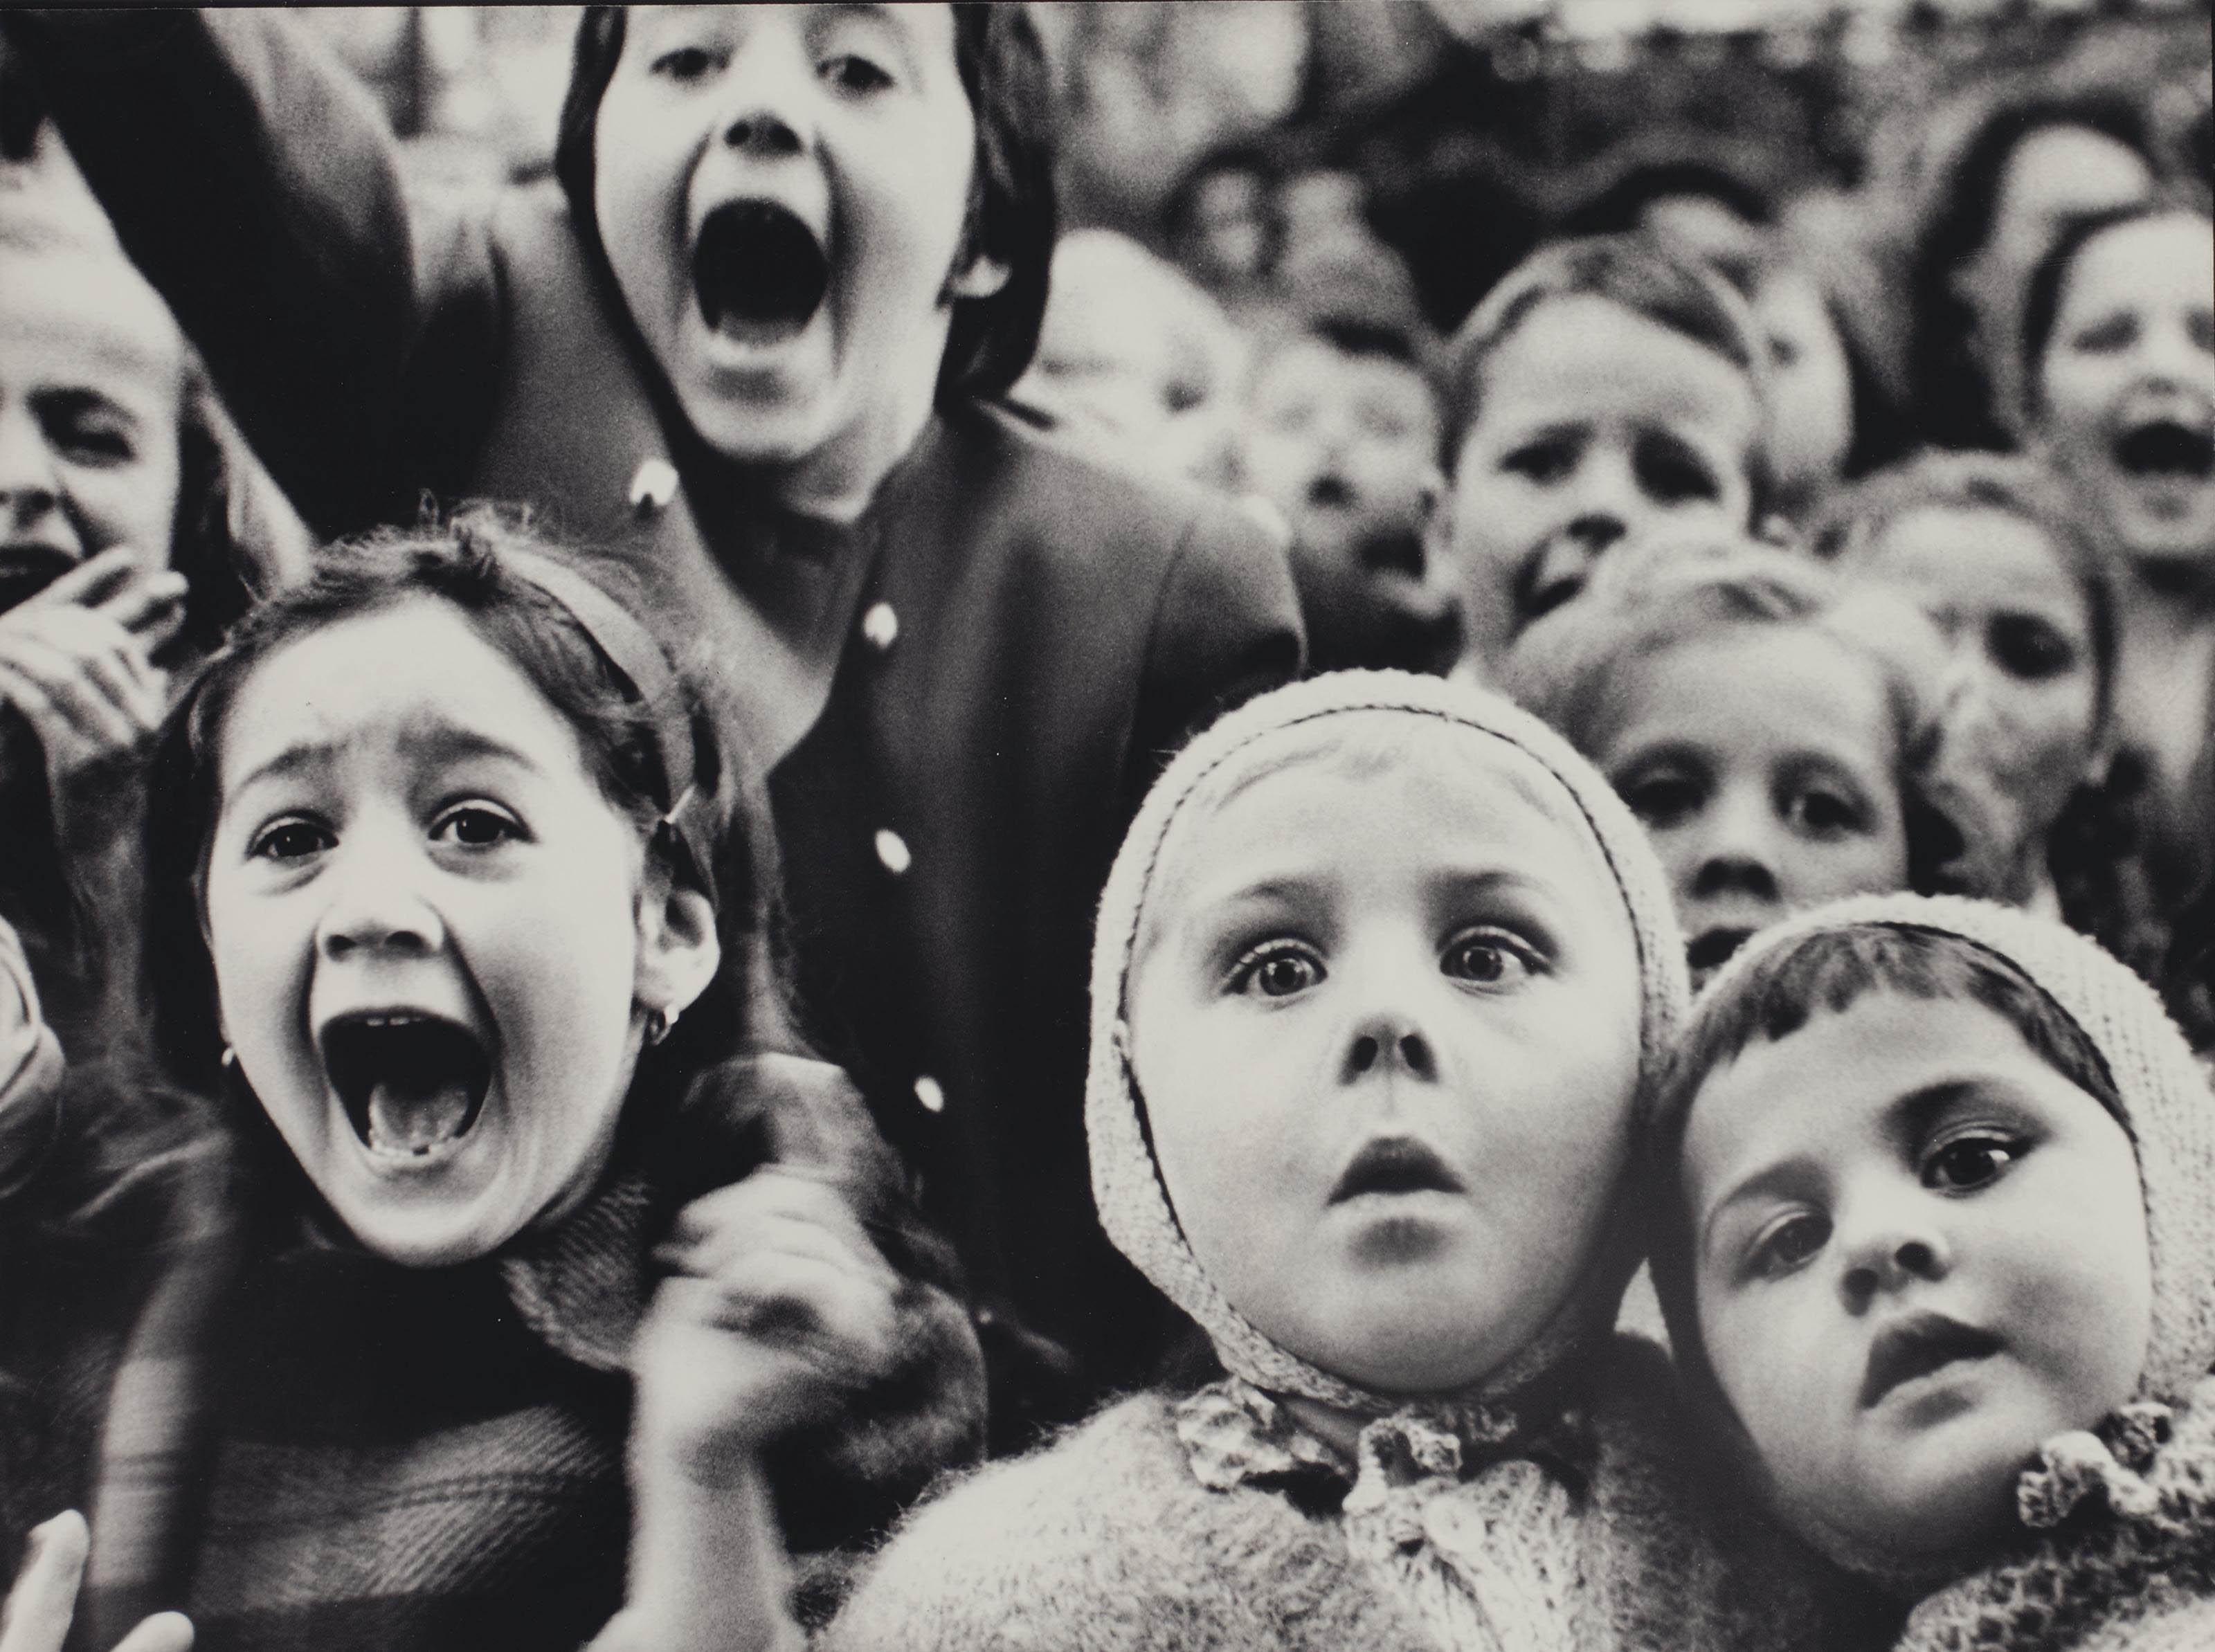 Children watching Puppet Theater in the Tuileries Gardens, Paris, 1964